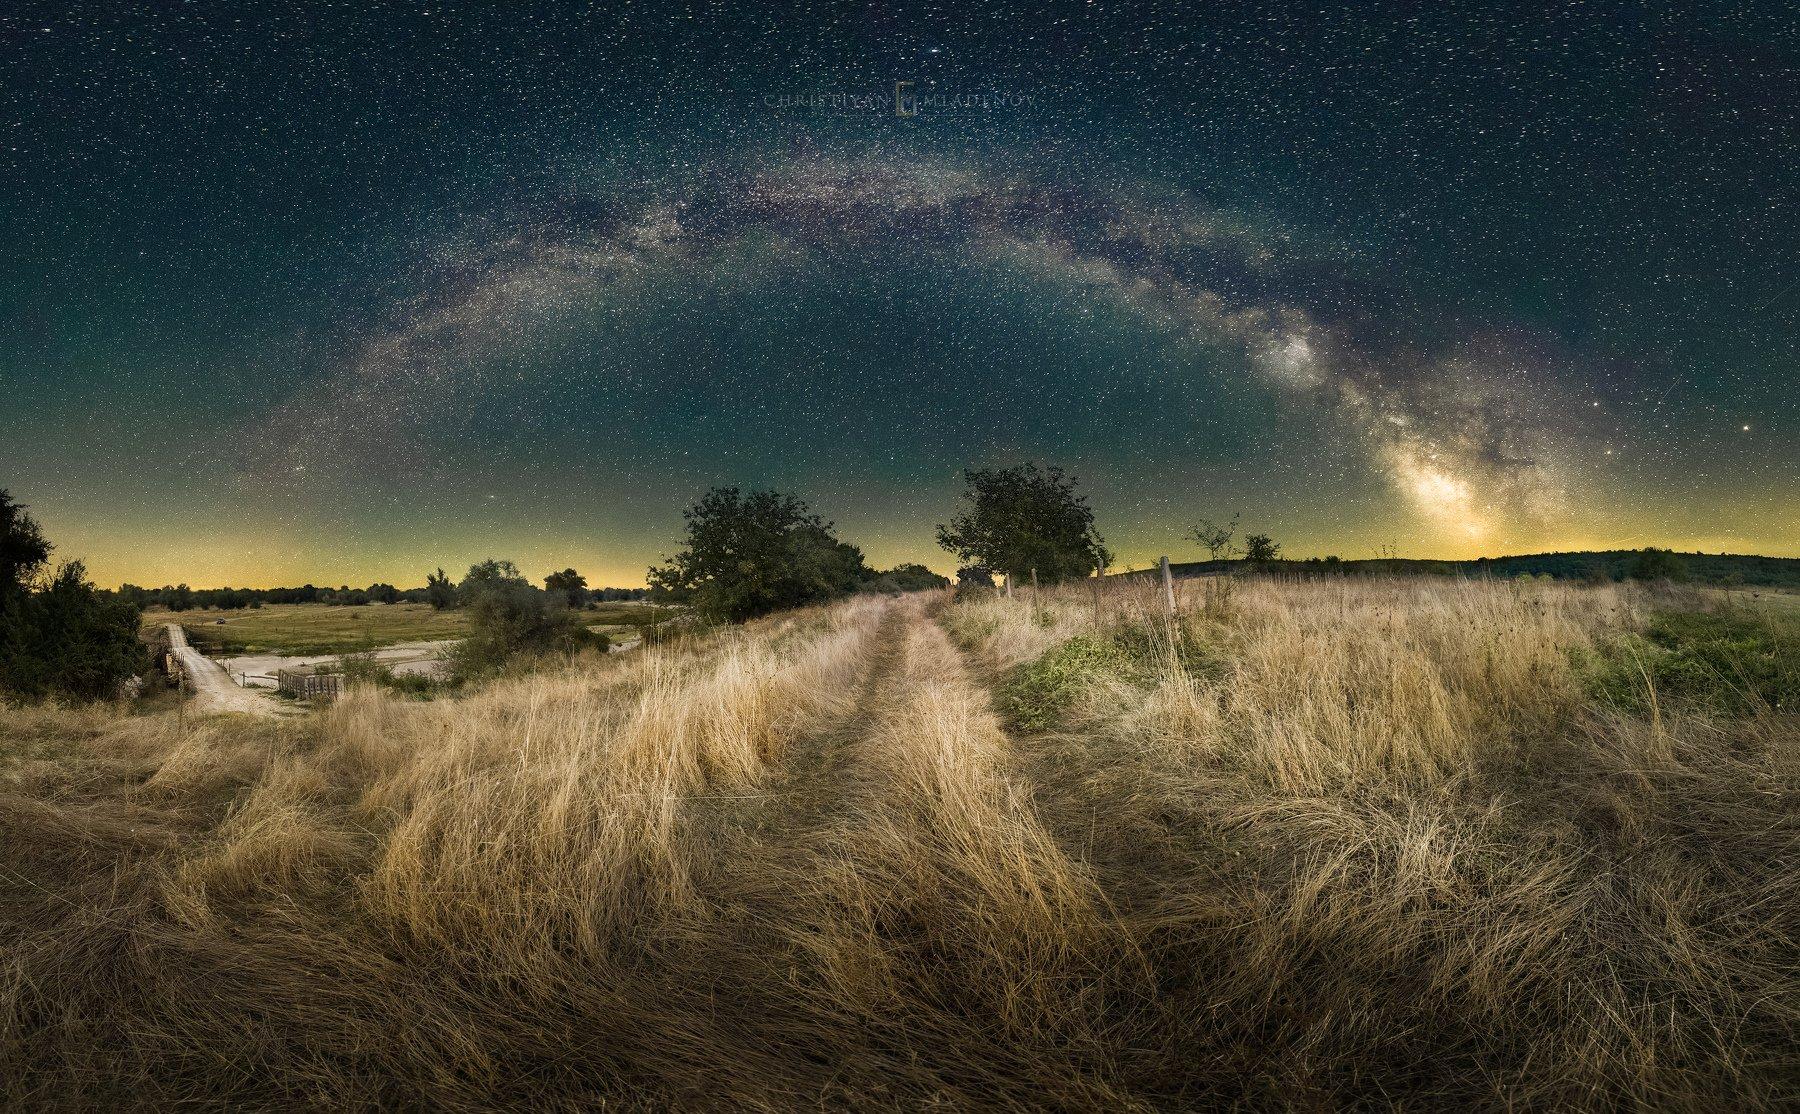 astrophotography, astronomy, galaxy, milky way, nightscape, night, sky, stars, long exposure, nature, bulgaria, space, panorama, Кристиян Младенов